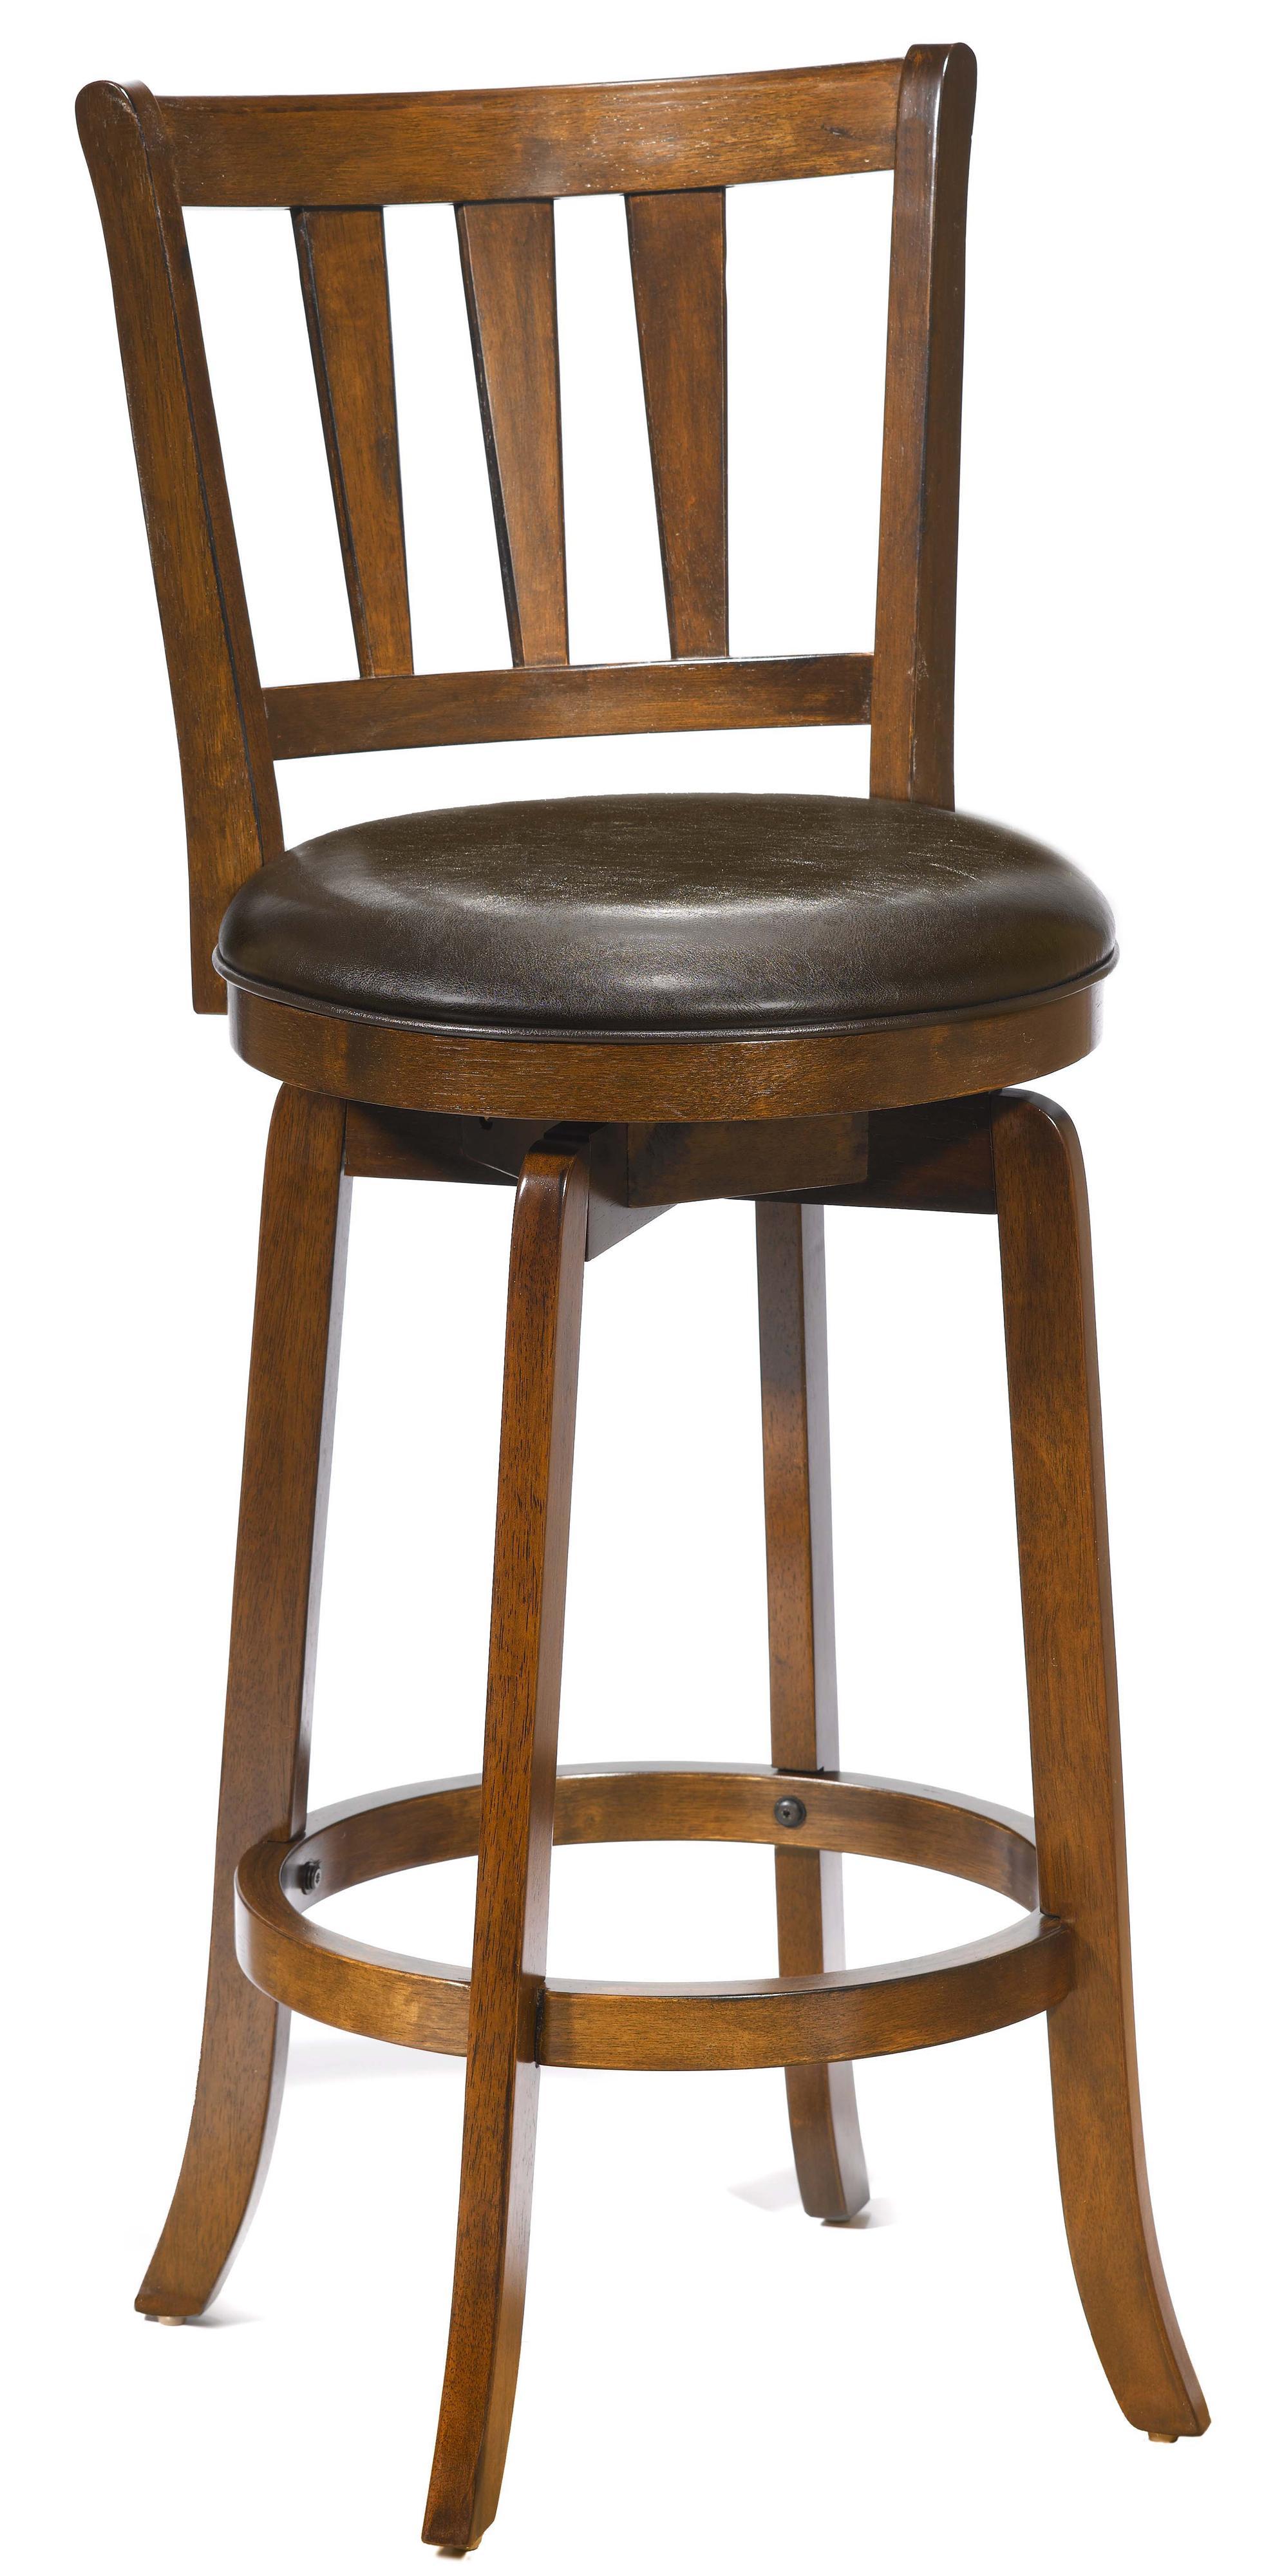 "Wood Stools 30"" Bar Height Presque Isle Swivel Bar Stool by Hillsdale at Novello Home Furnishings"